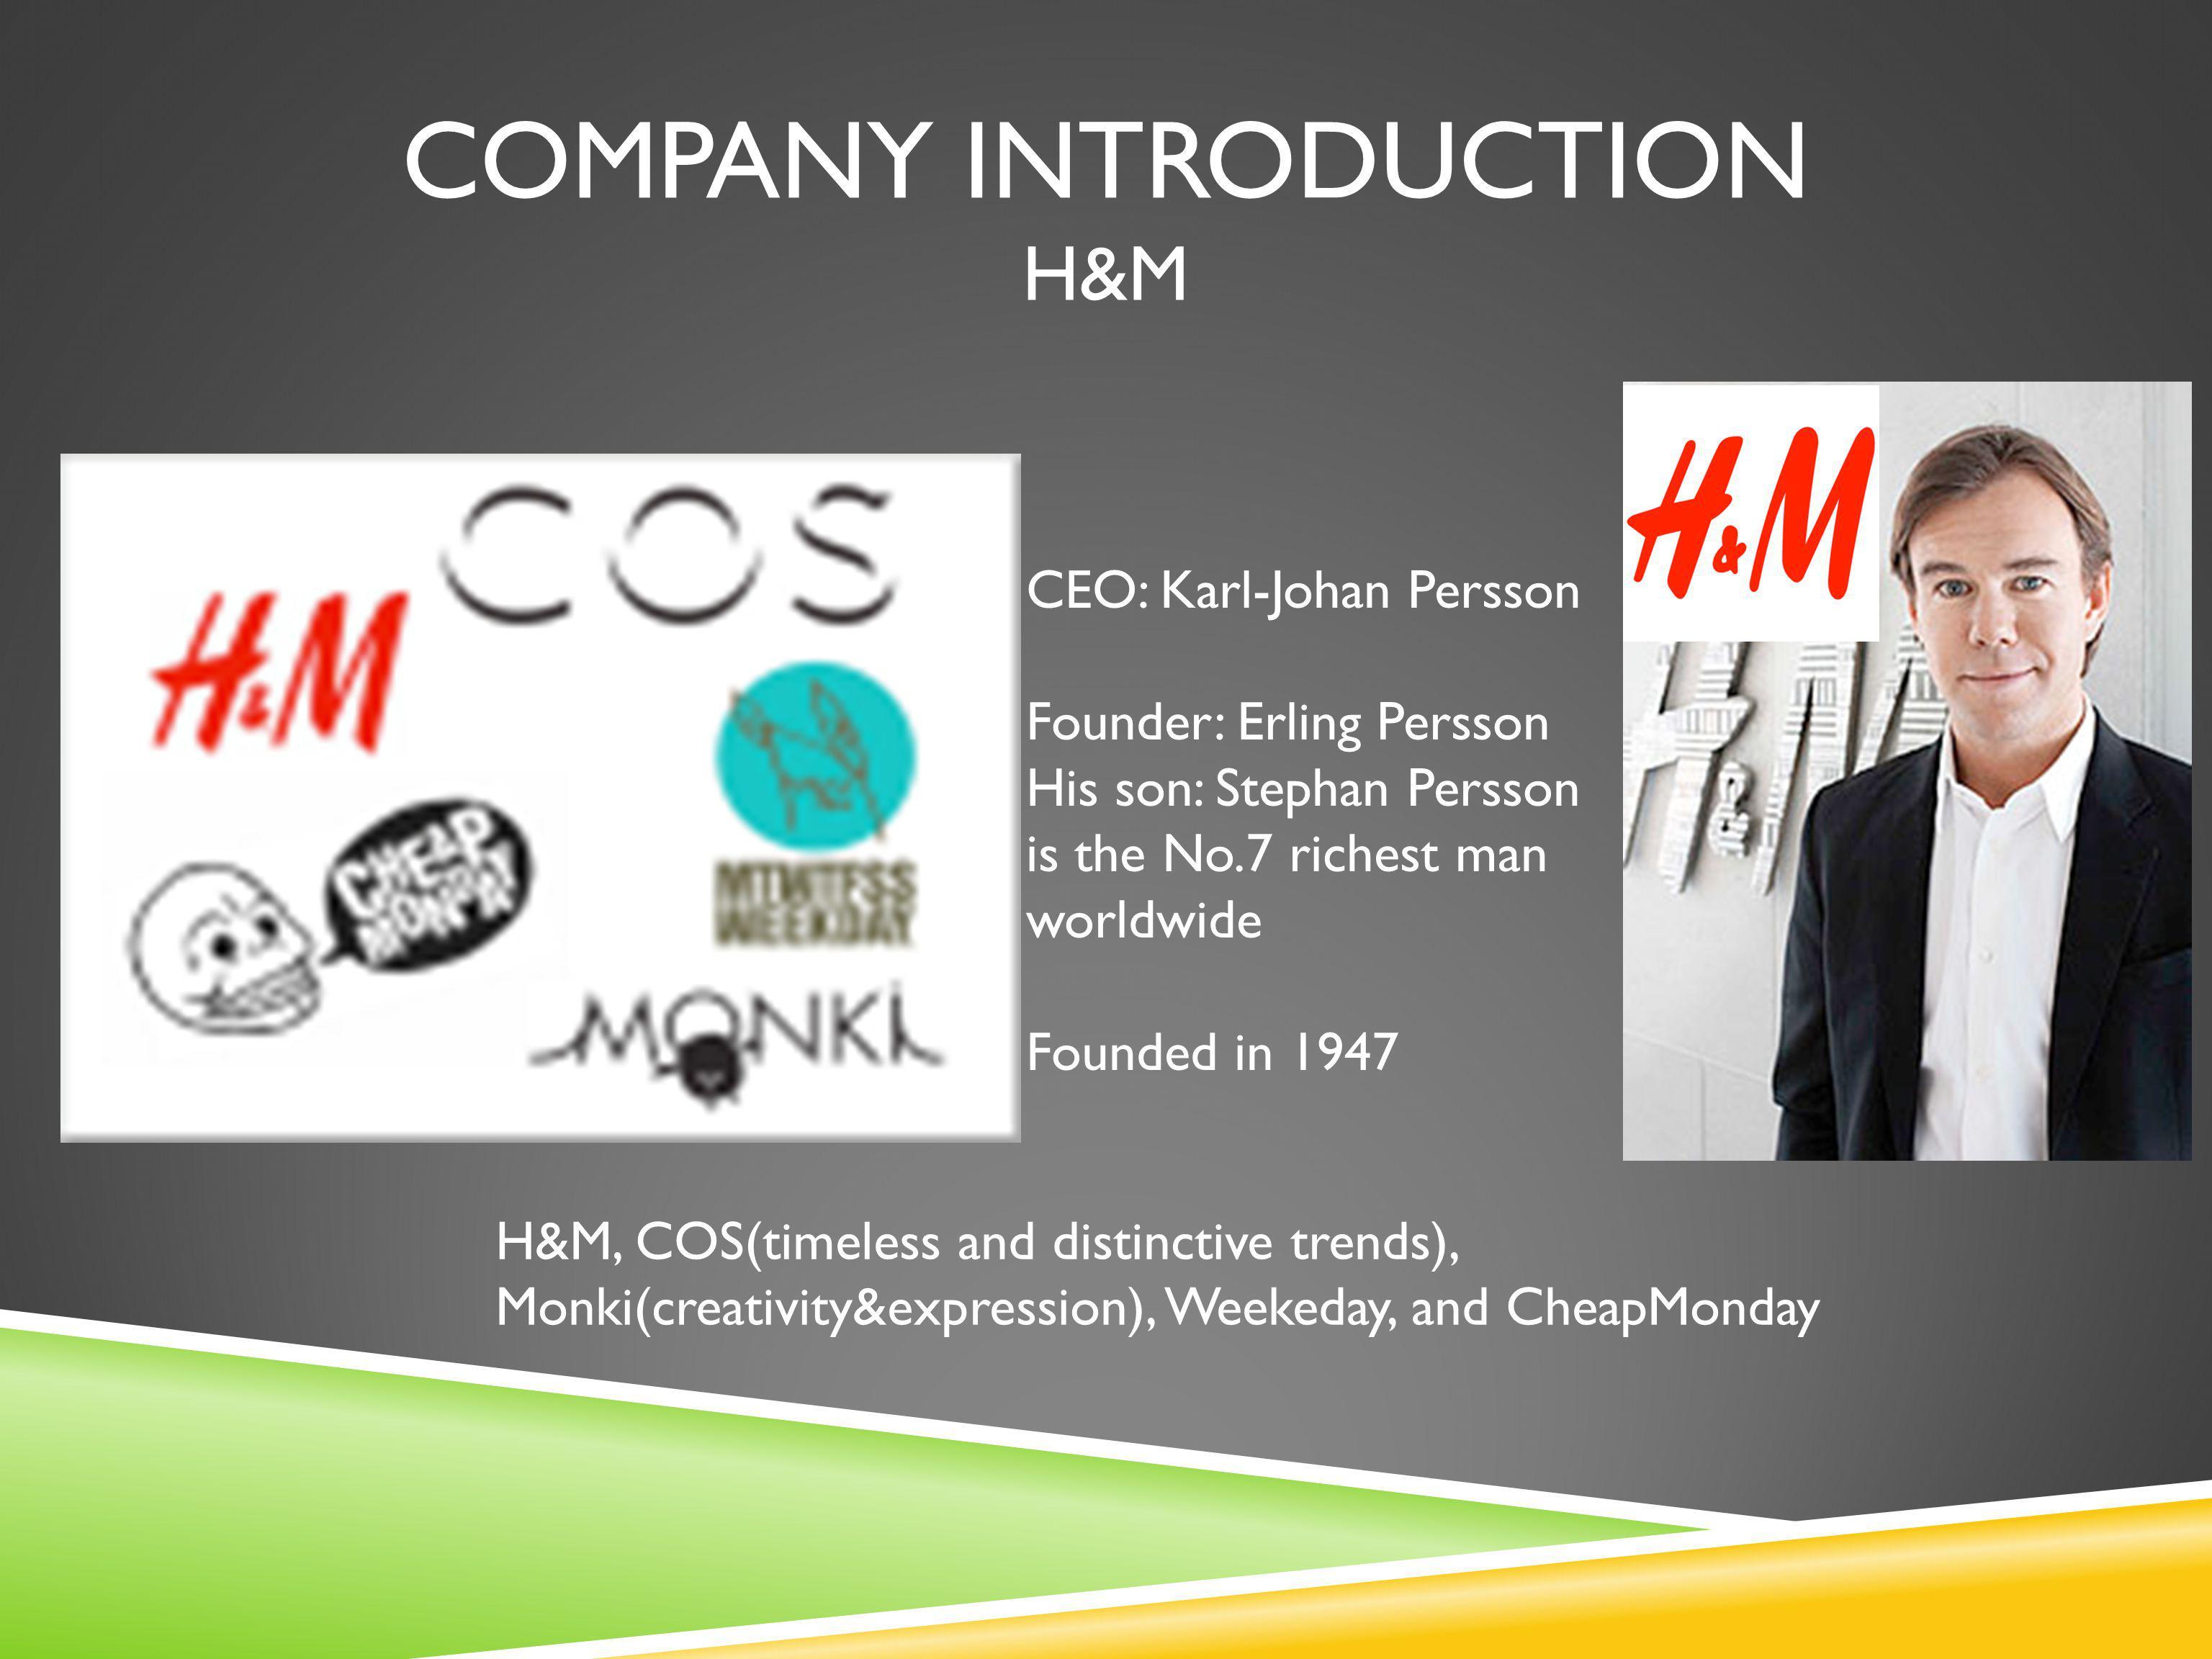 Company INTRODUCTION H&M